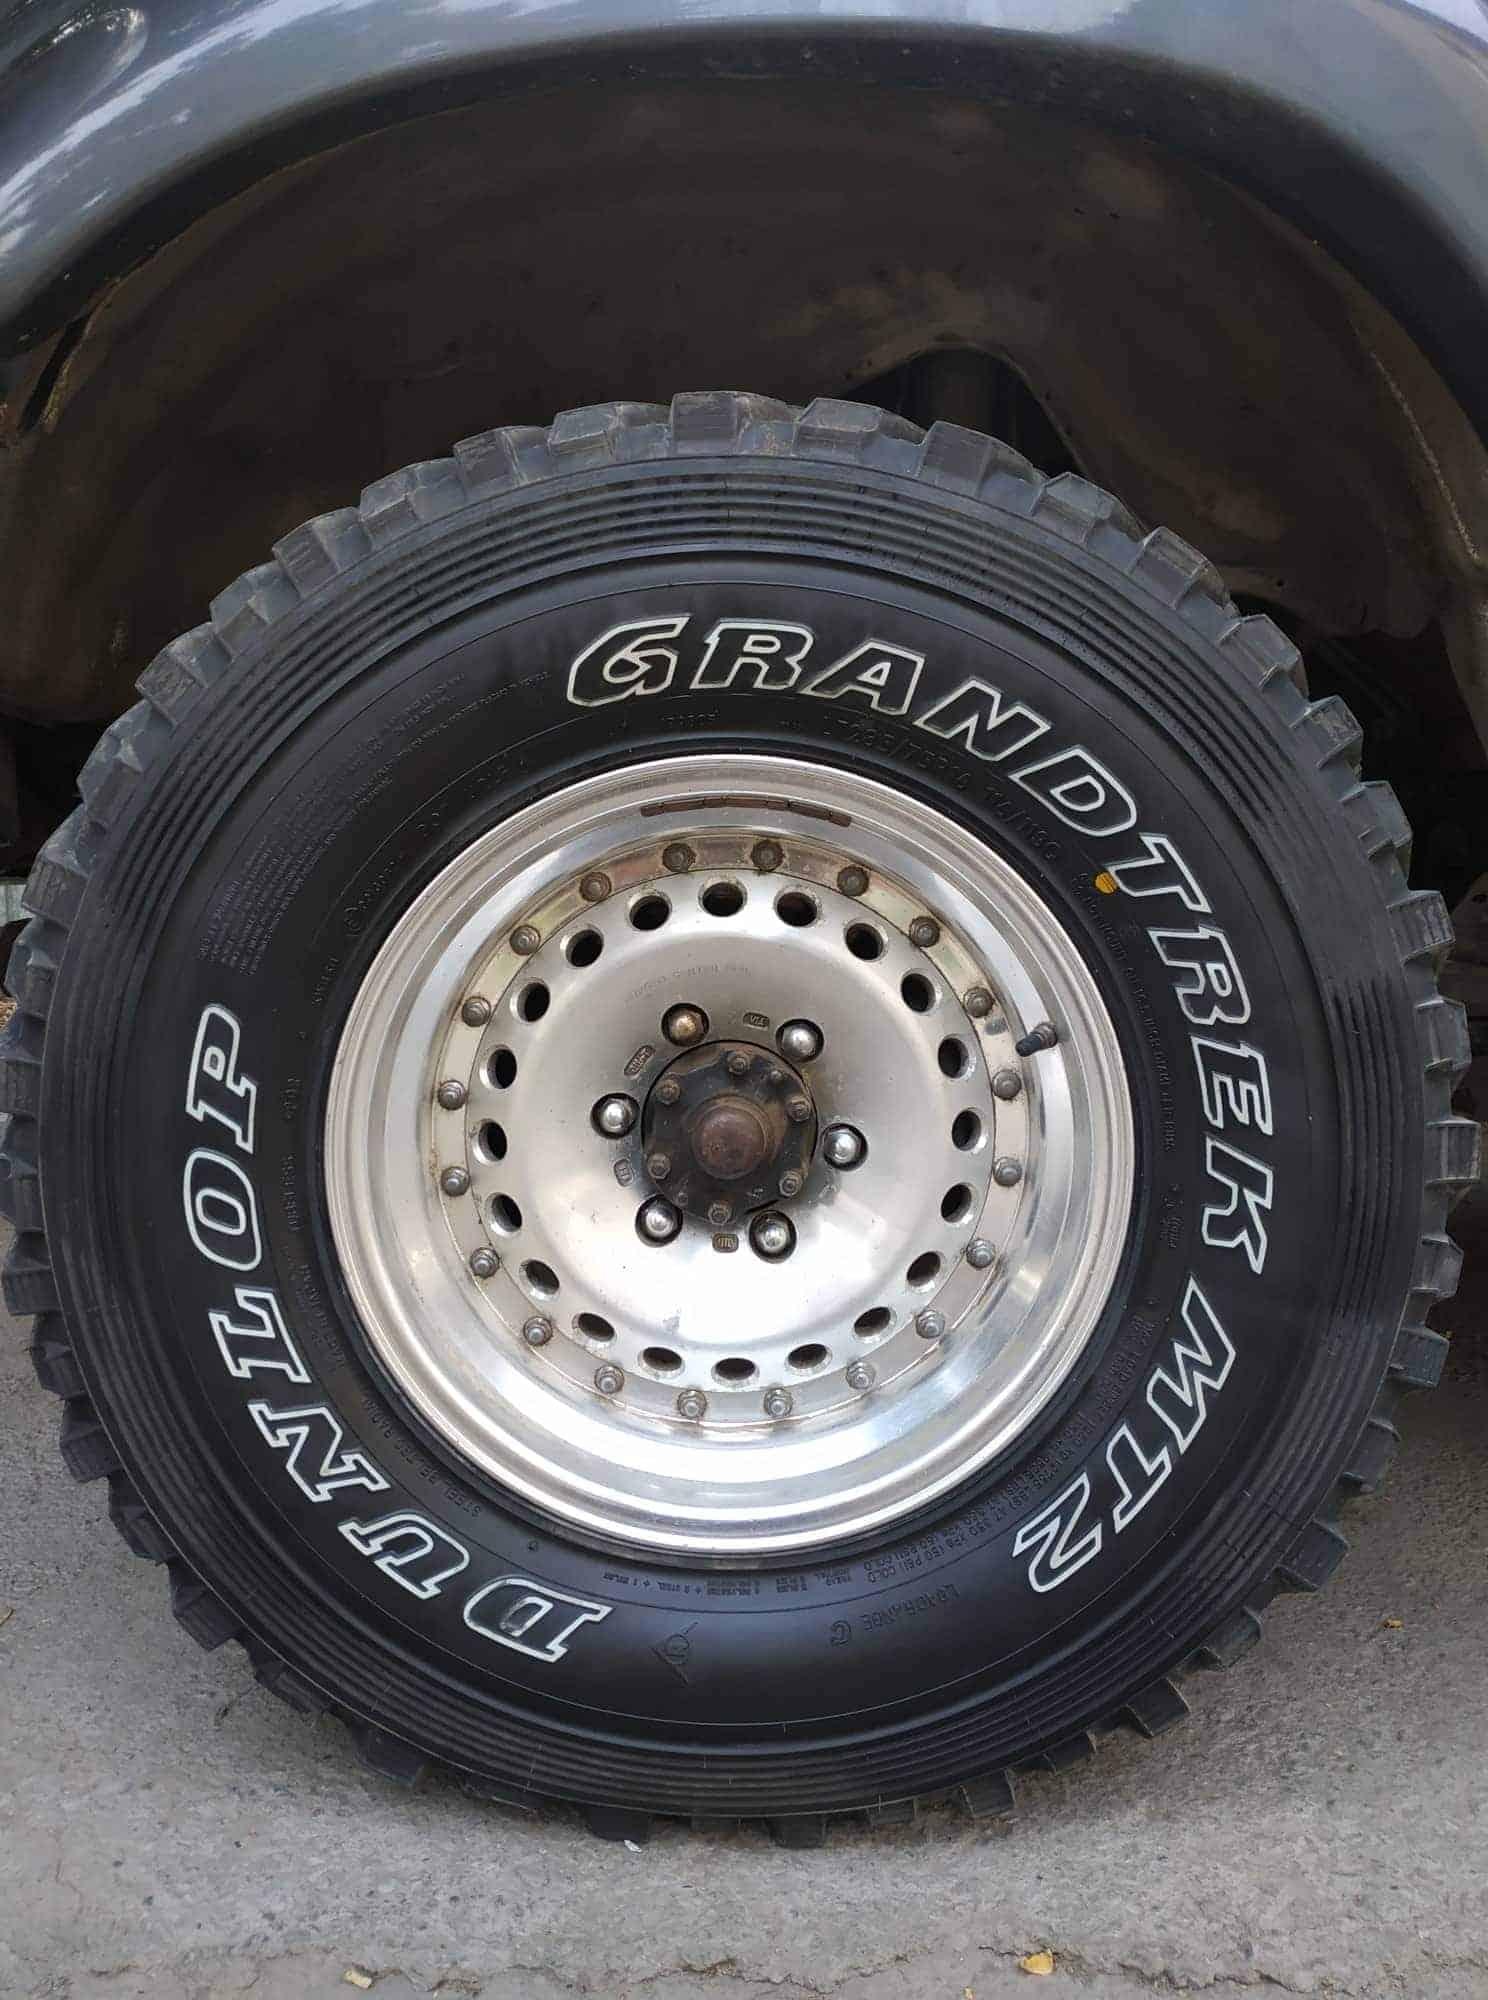 Mud terrain roue GRANDTRECK MT2 DUNLOP 4x4 ountravela toyota disque aluminium